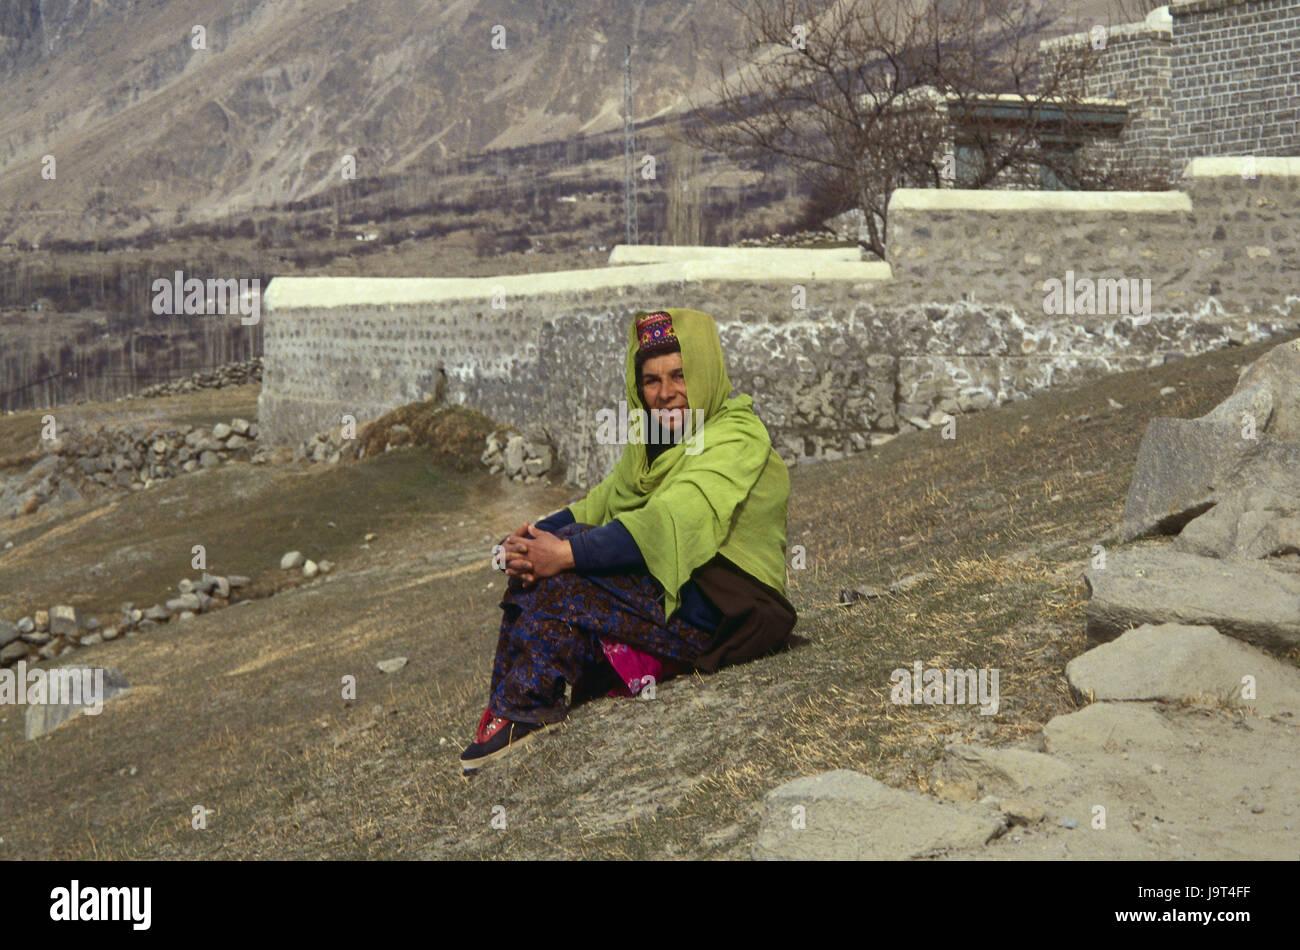 Pakistan,Karimabad,woman,Hunzukuc strain,sit,at the side,no model release,Asia,Karakorumgebirge,Karakorum,Hunzatal,Hunzukuc,tribe,locals,clothes,headgear,traditionally,outside,whole - Stock Image